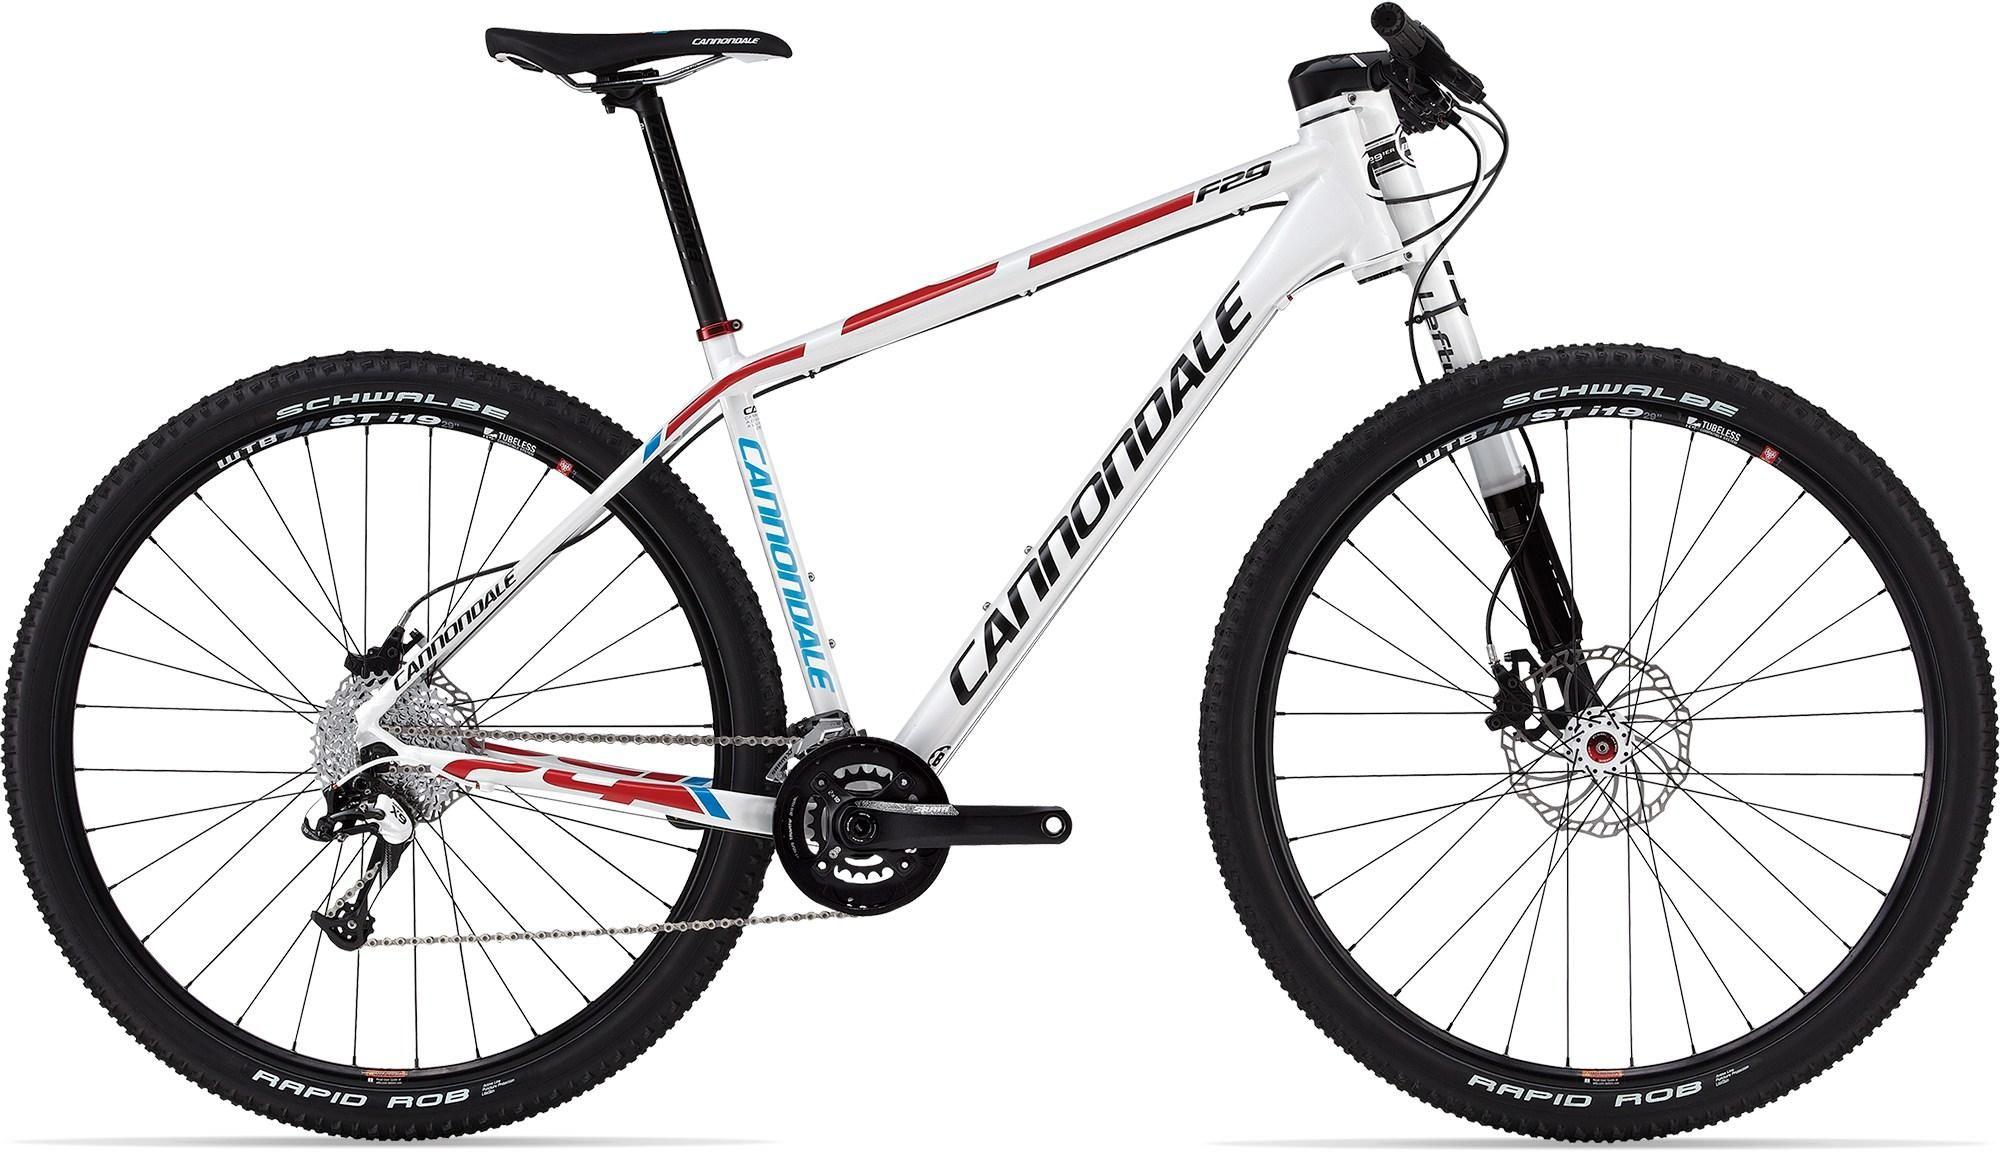 Cannondale F29 Alloy 1 Bike 2013 Hardtail Mountain Bike Giant Bicycle 29er Mountain Bikes